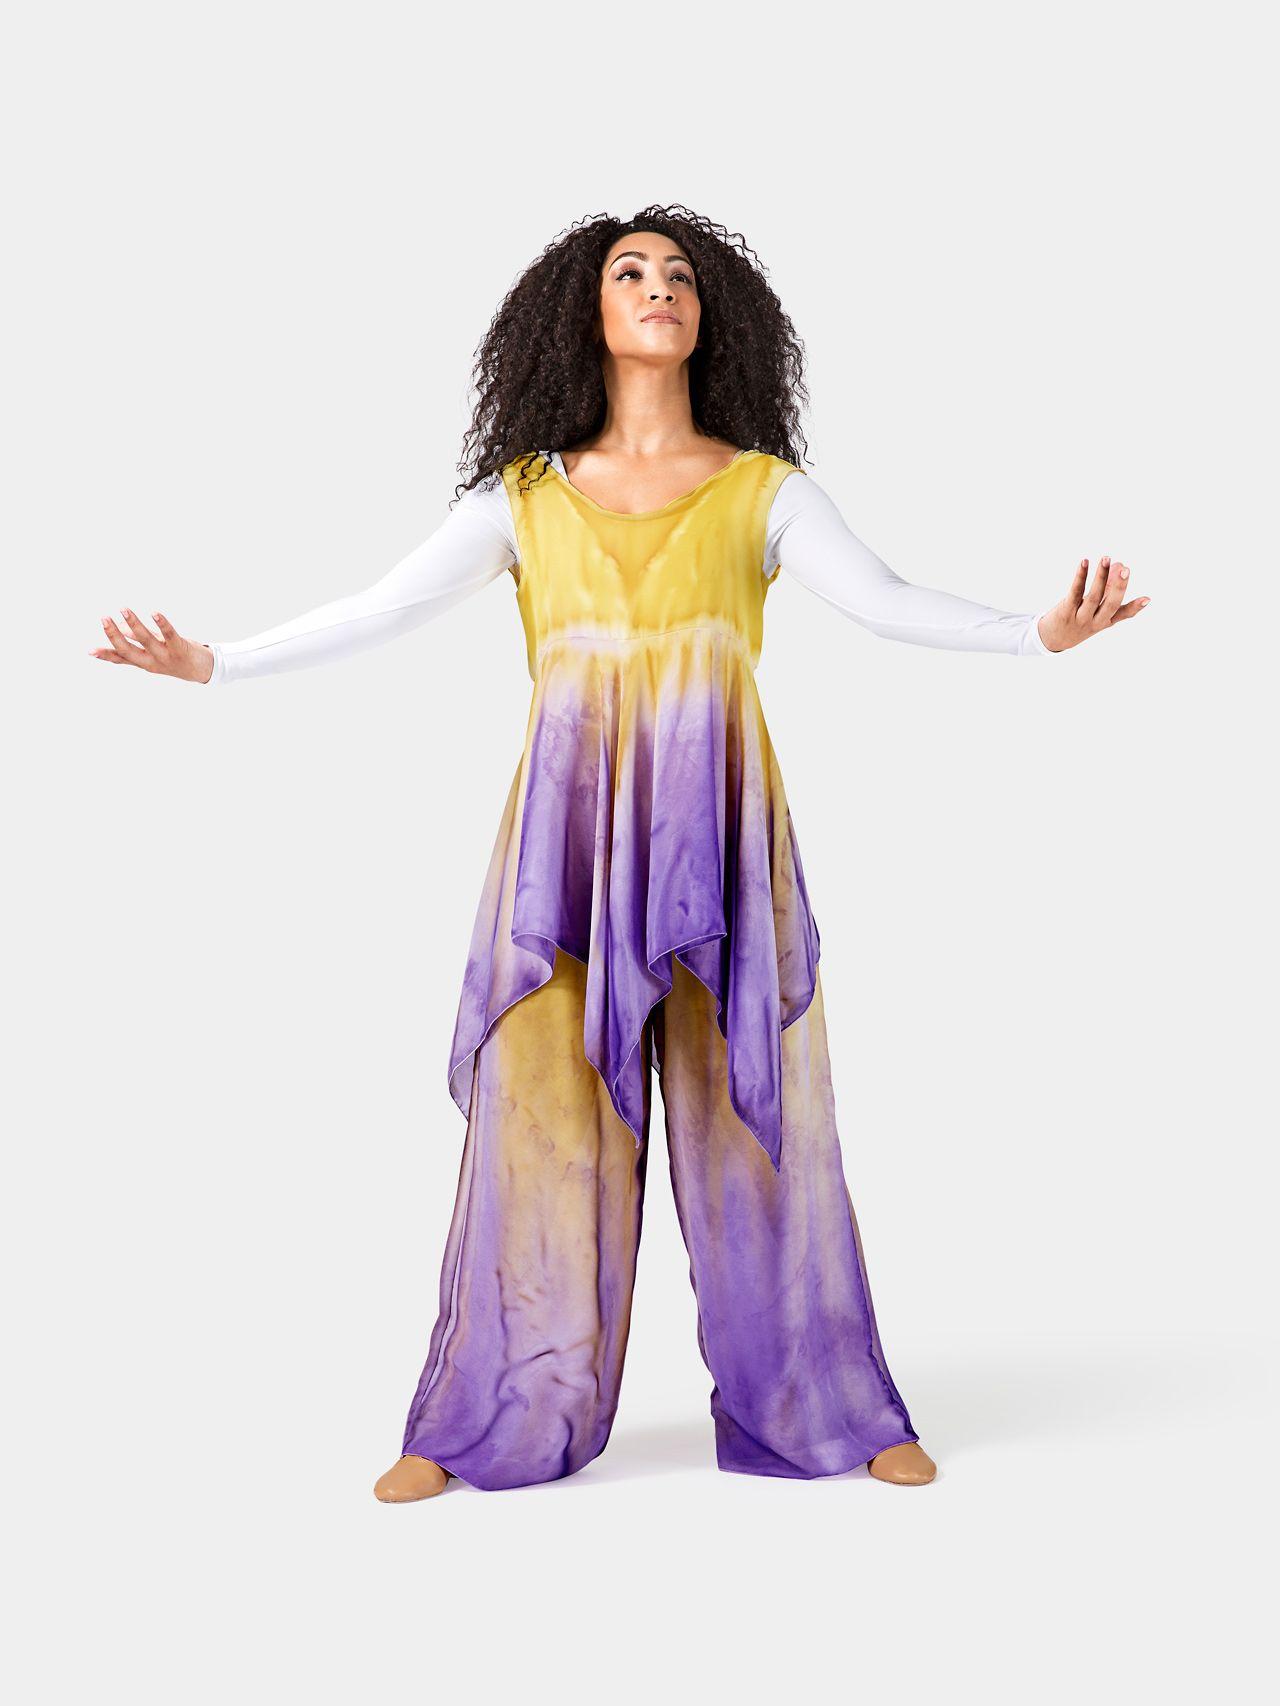 watercolor praise dance garments praise dance garments